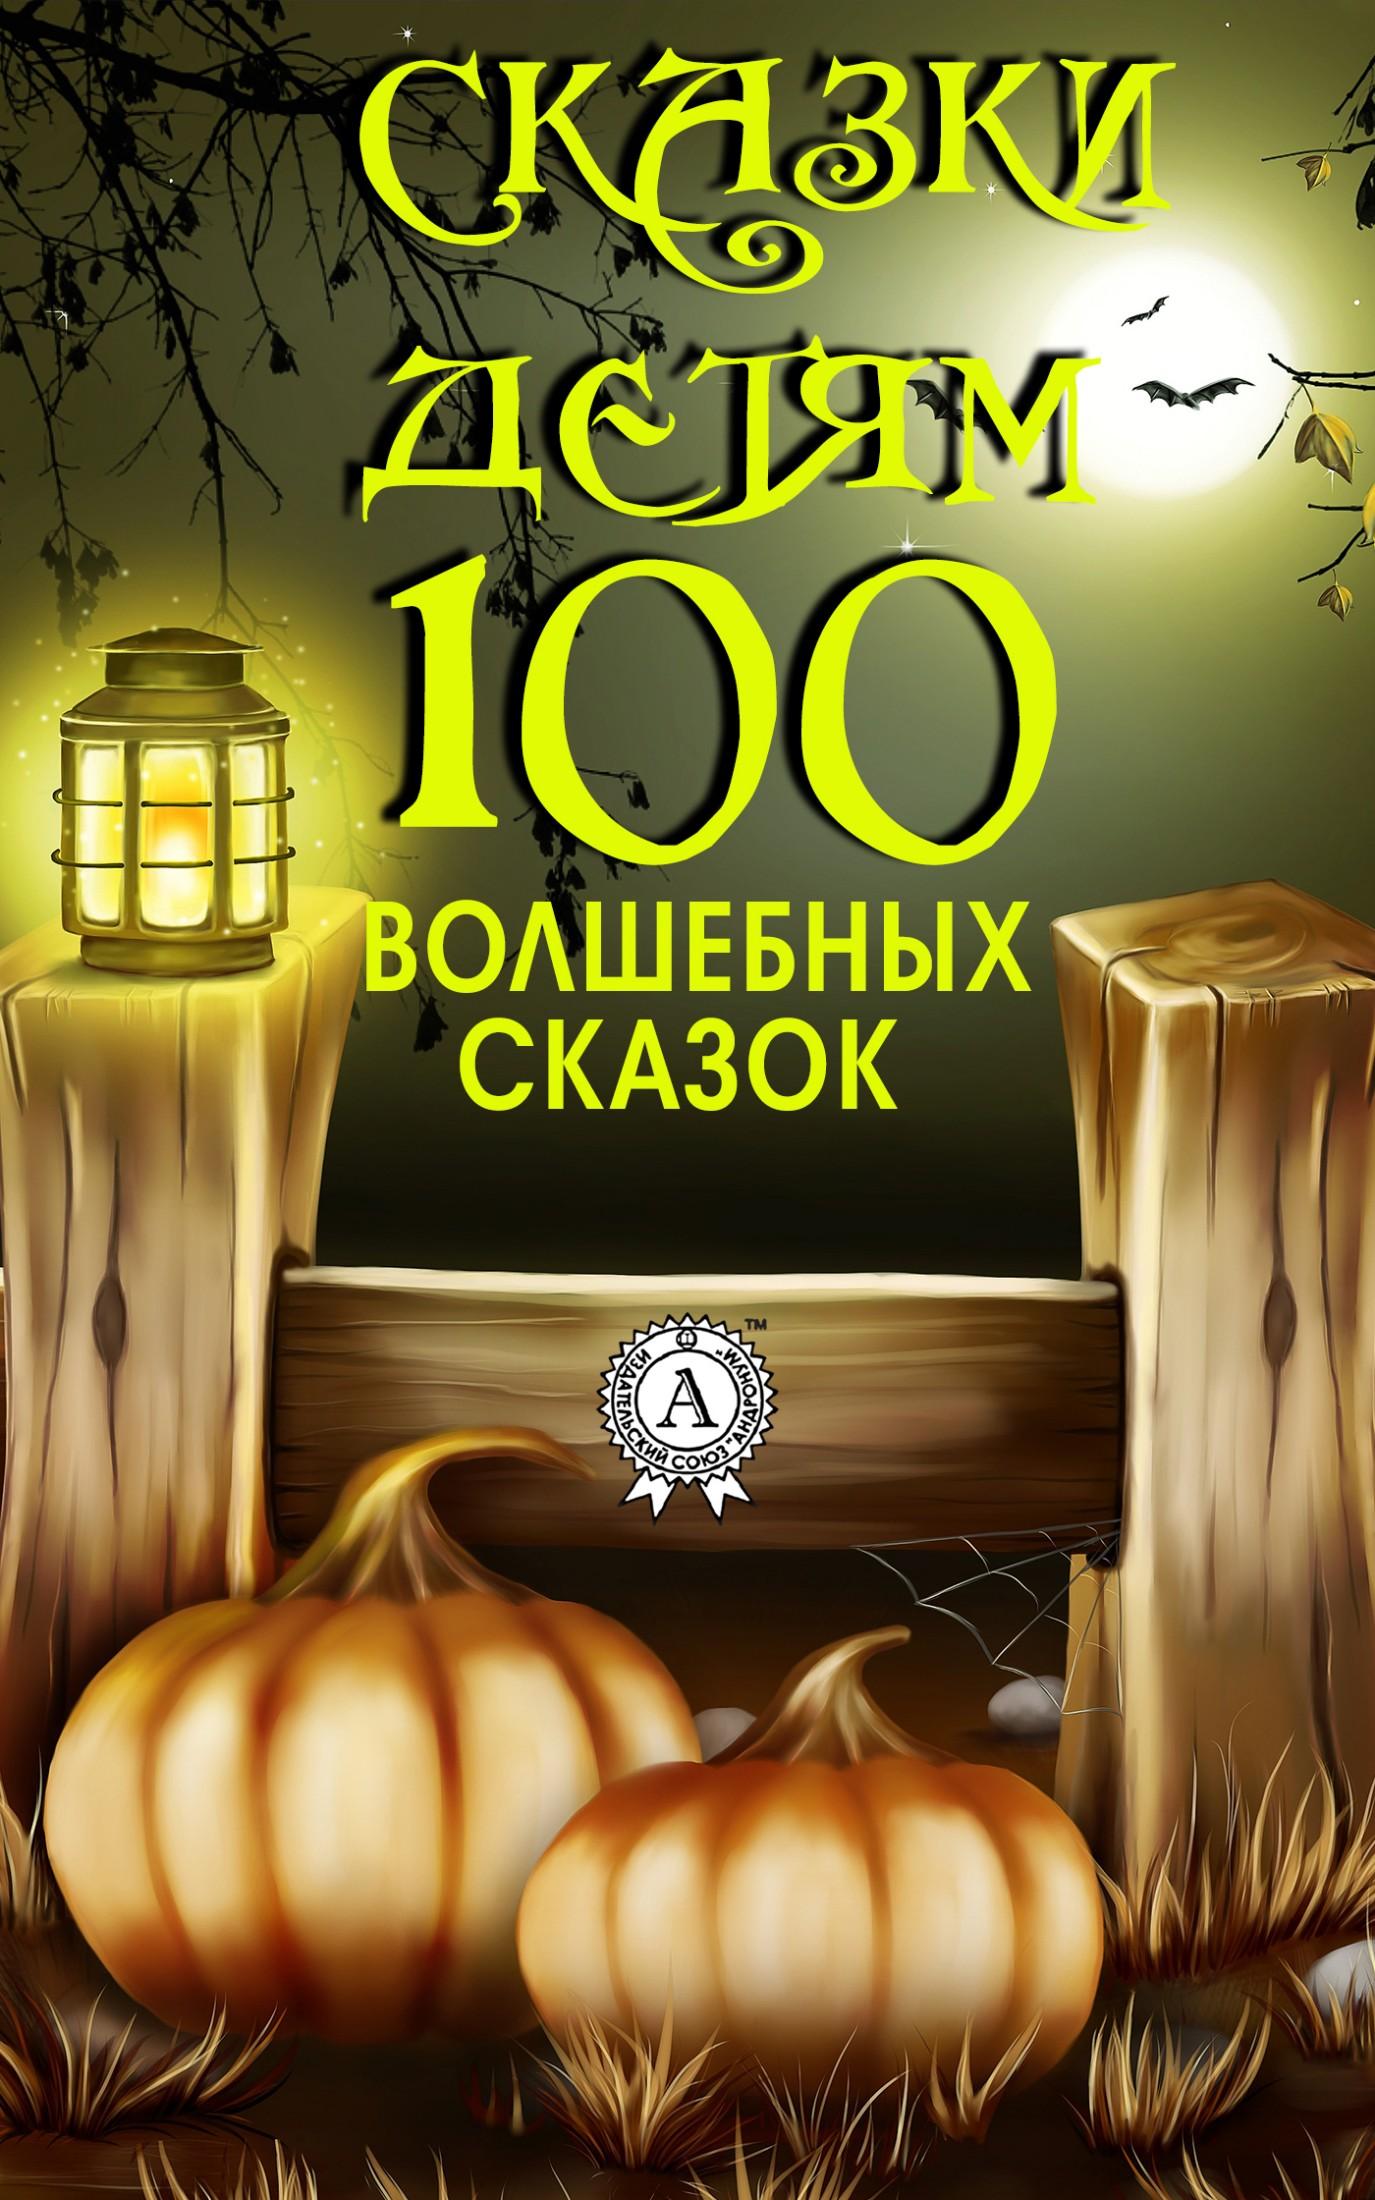 Ганс Крістіан Андерсен Сказки детям. 100 волшебных сказок